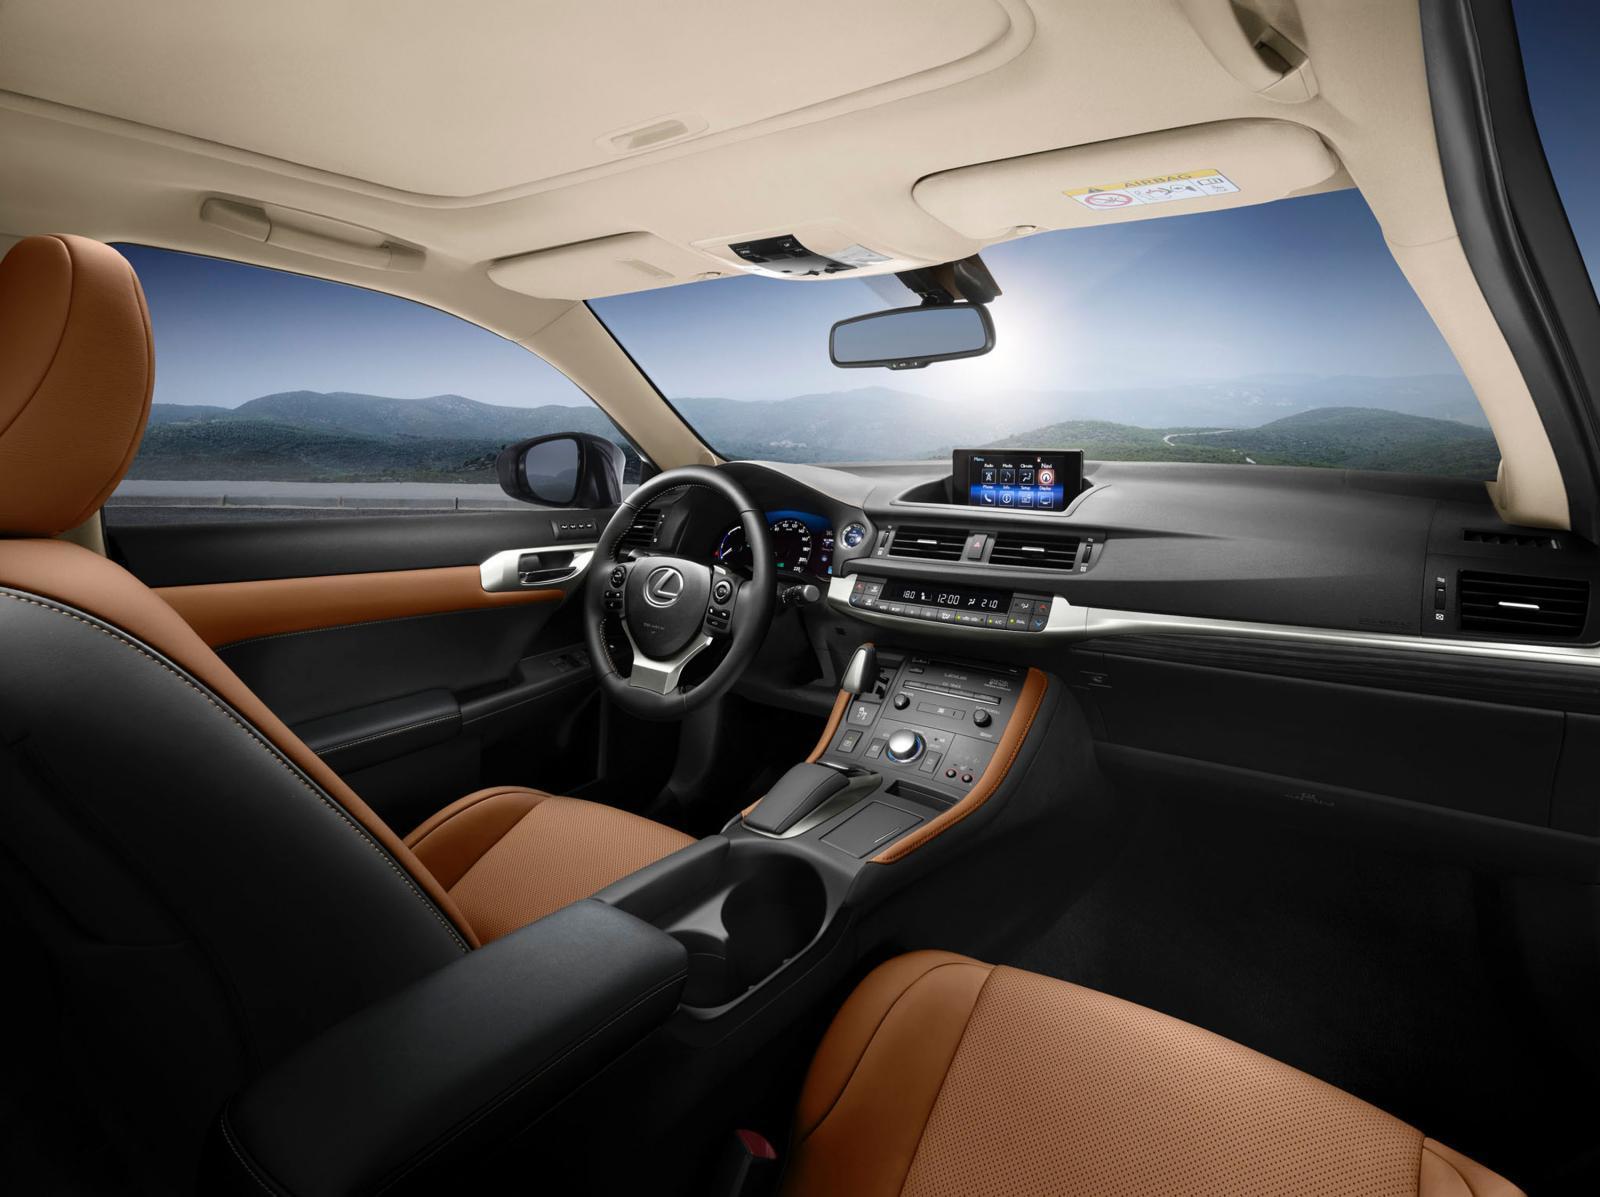 Foto de Lexus CT 200h 2014 (11/12)